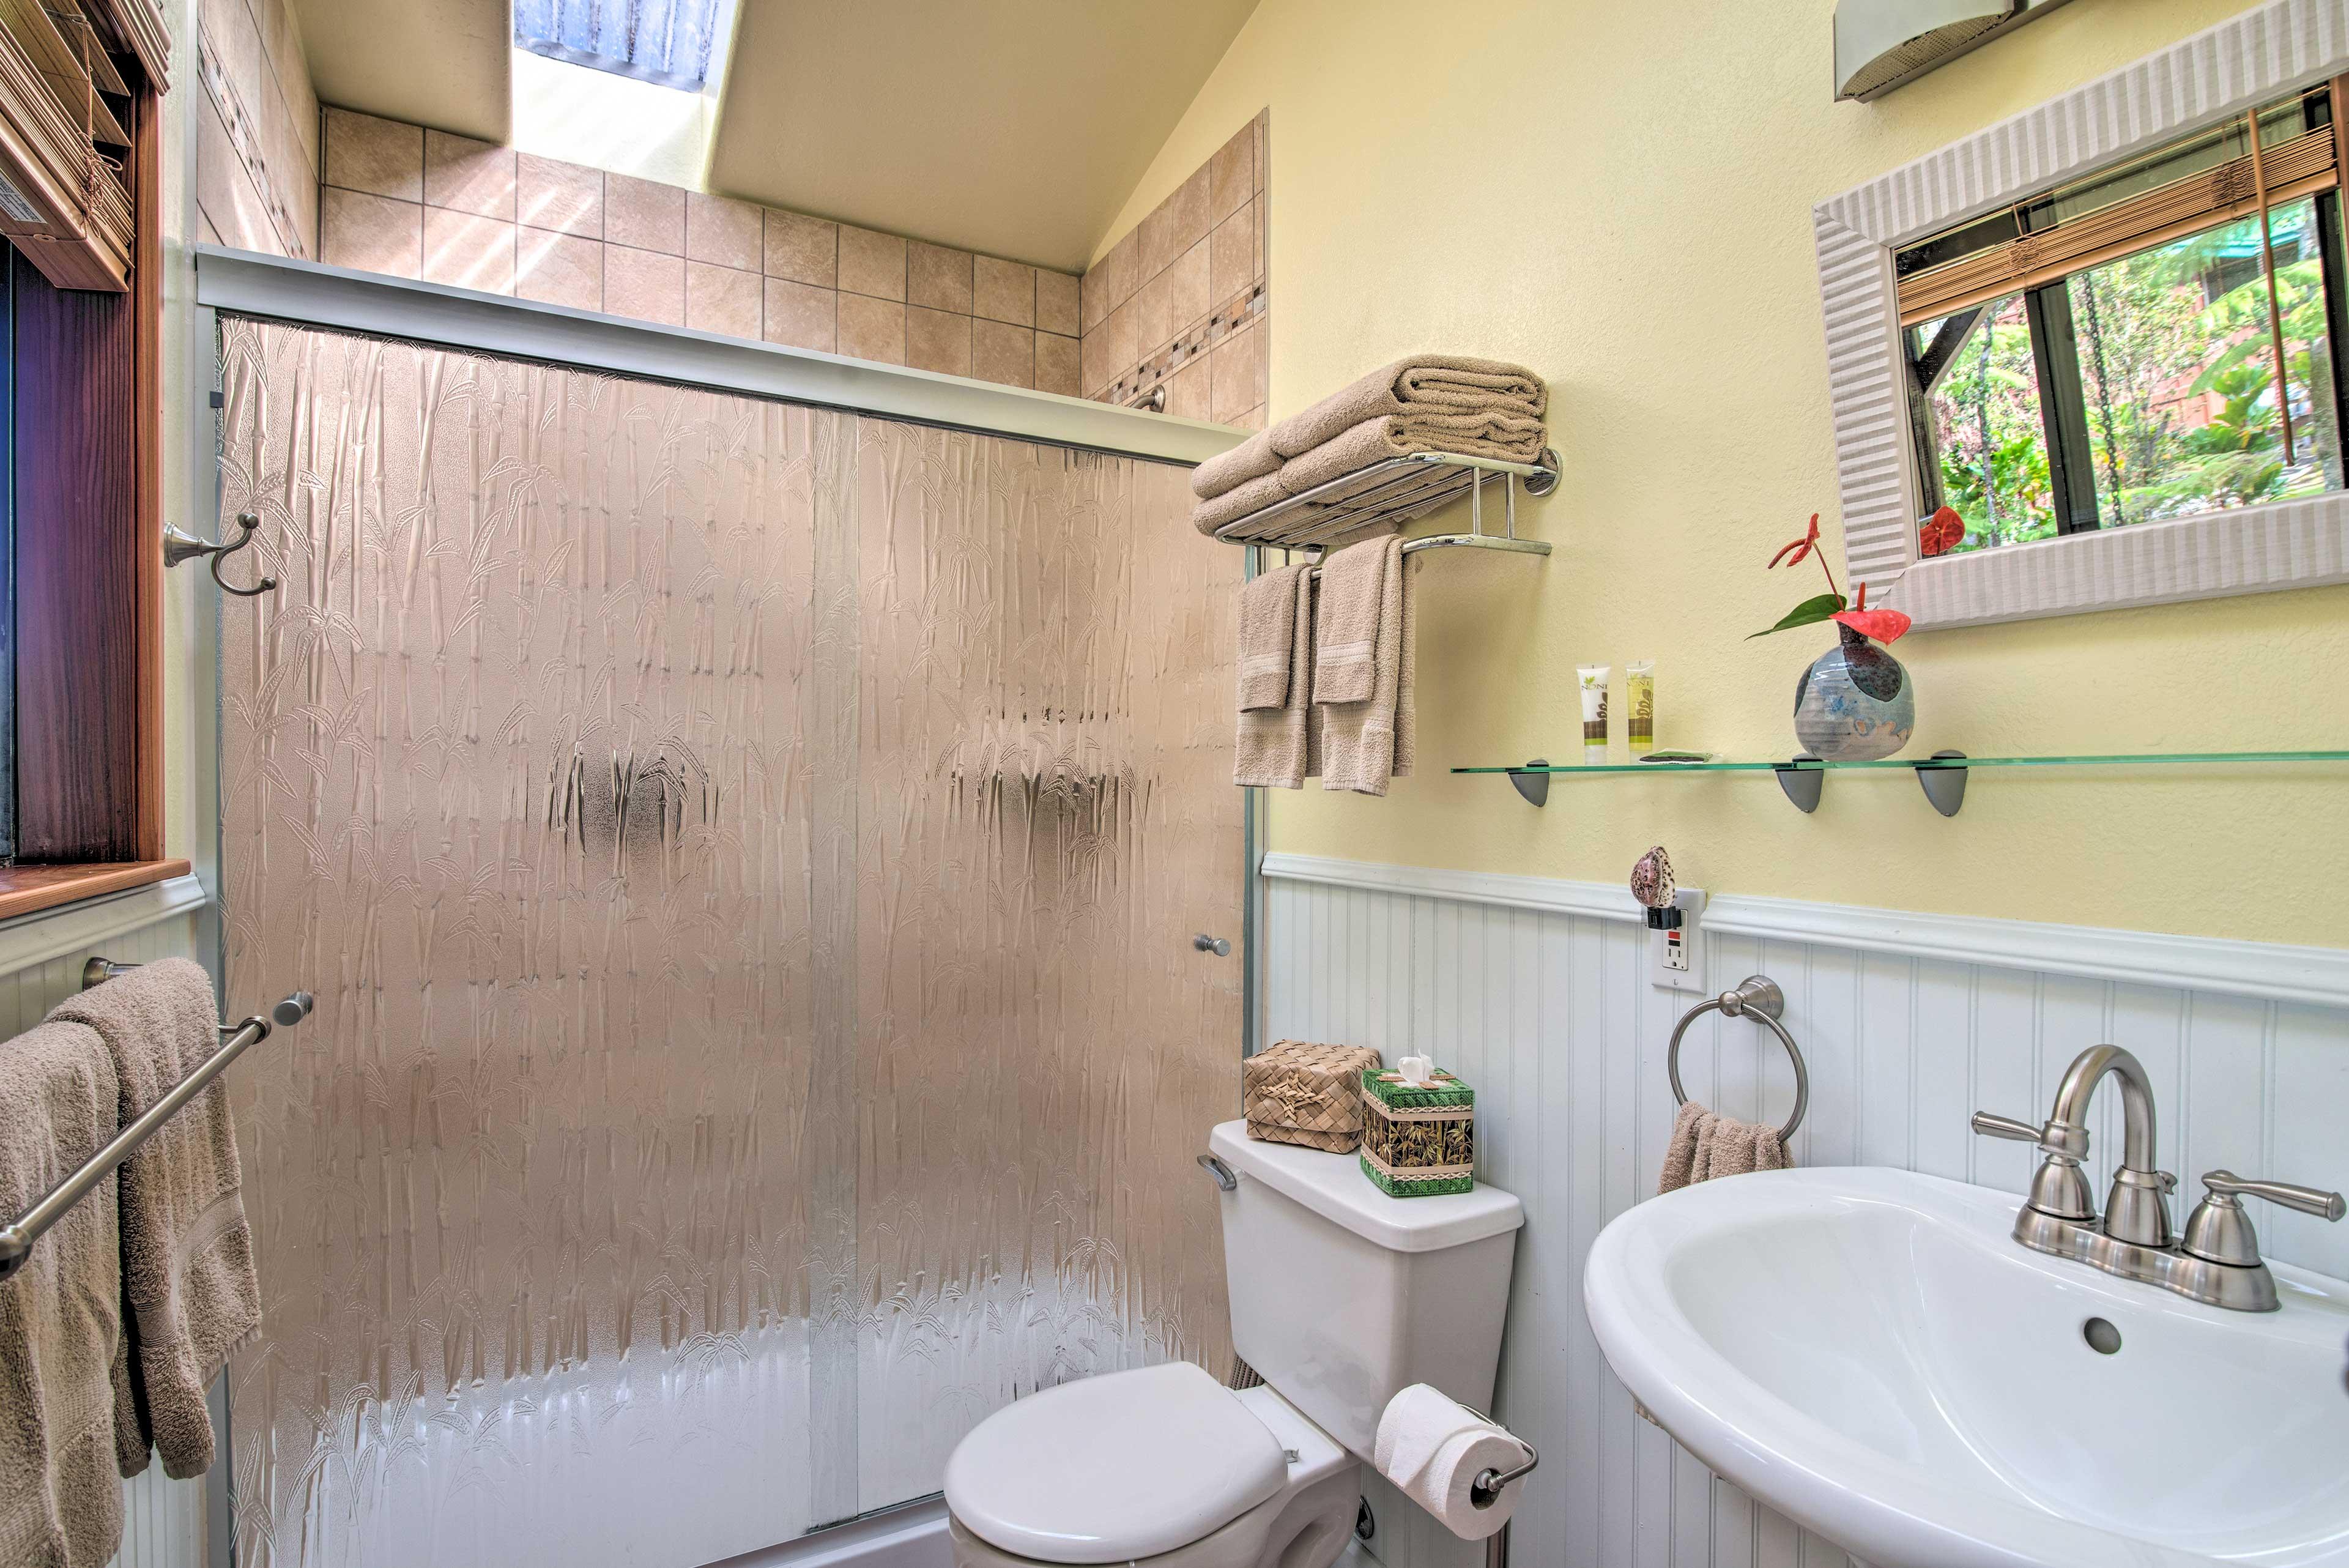 Bathroom | Complimentary Toiletries | Towels Provided